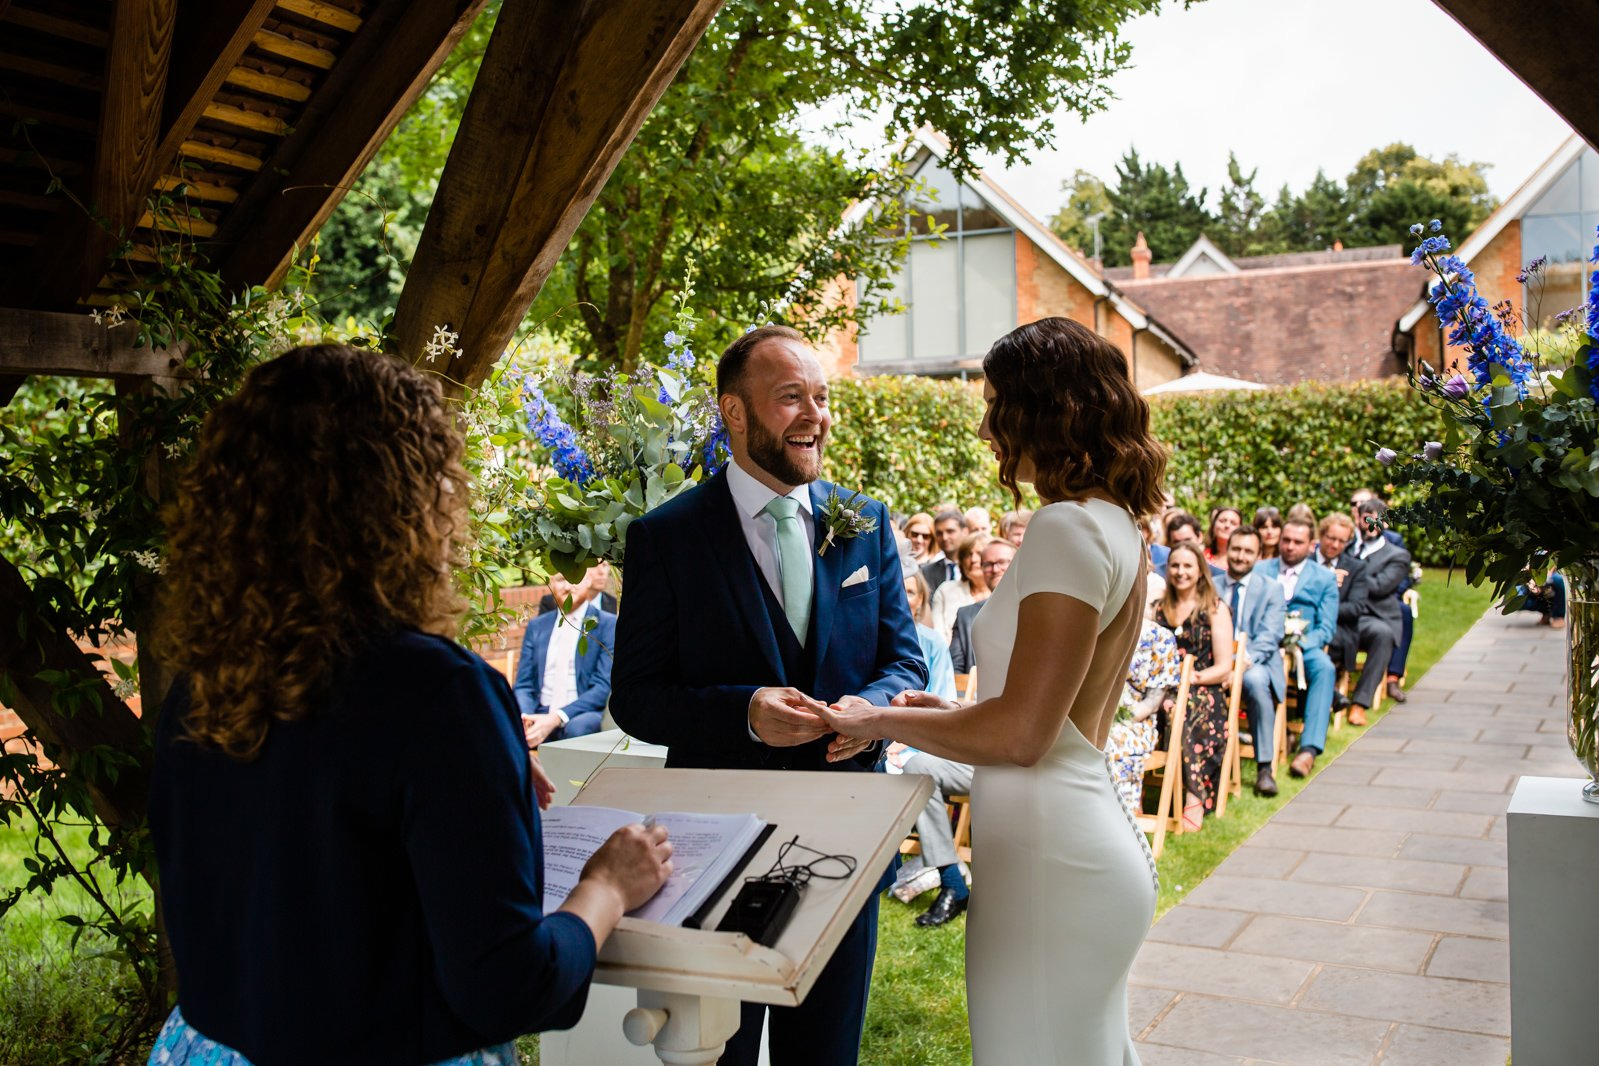 Millbridge Court Wedding - stunning summer wedding - wedding photography 58